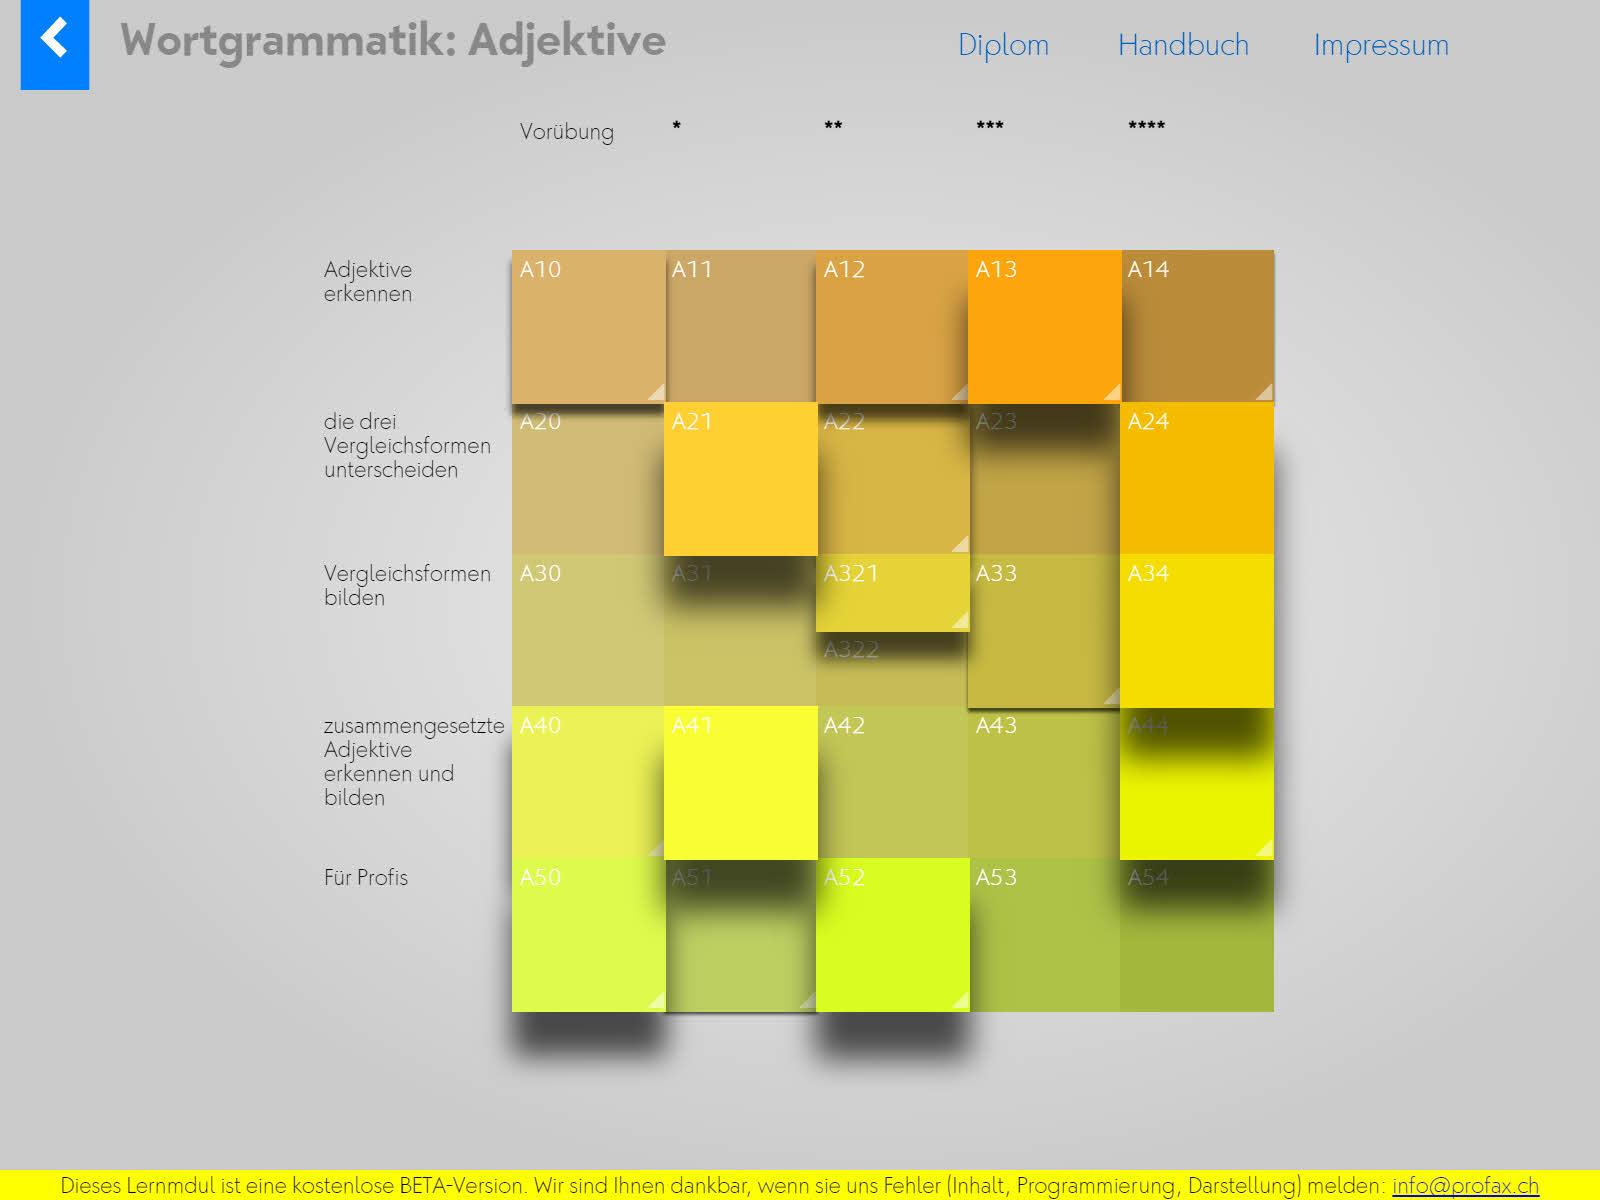 Wortgrammatik: Adjektive Background 5